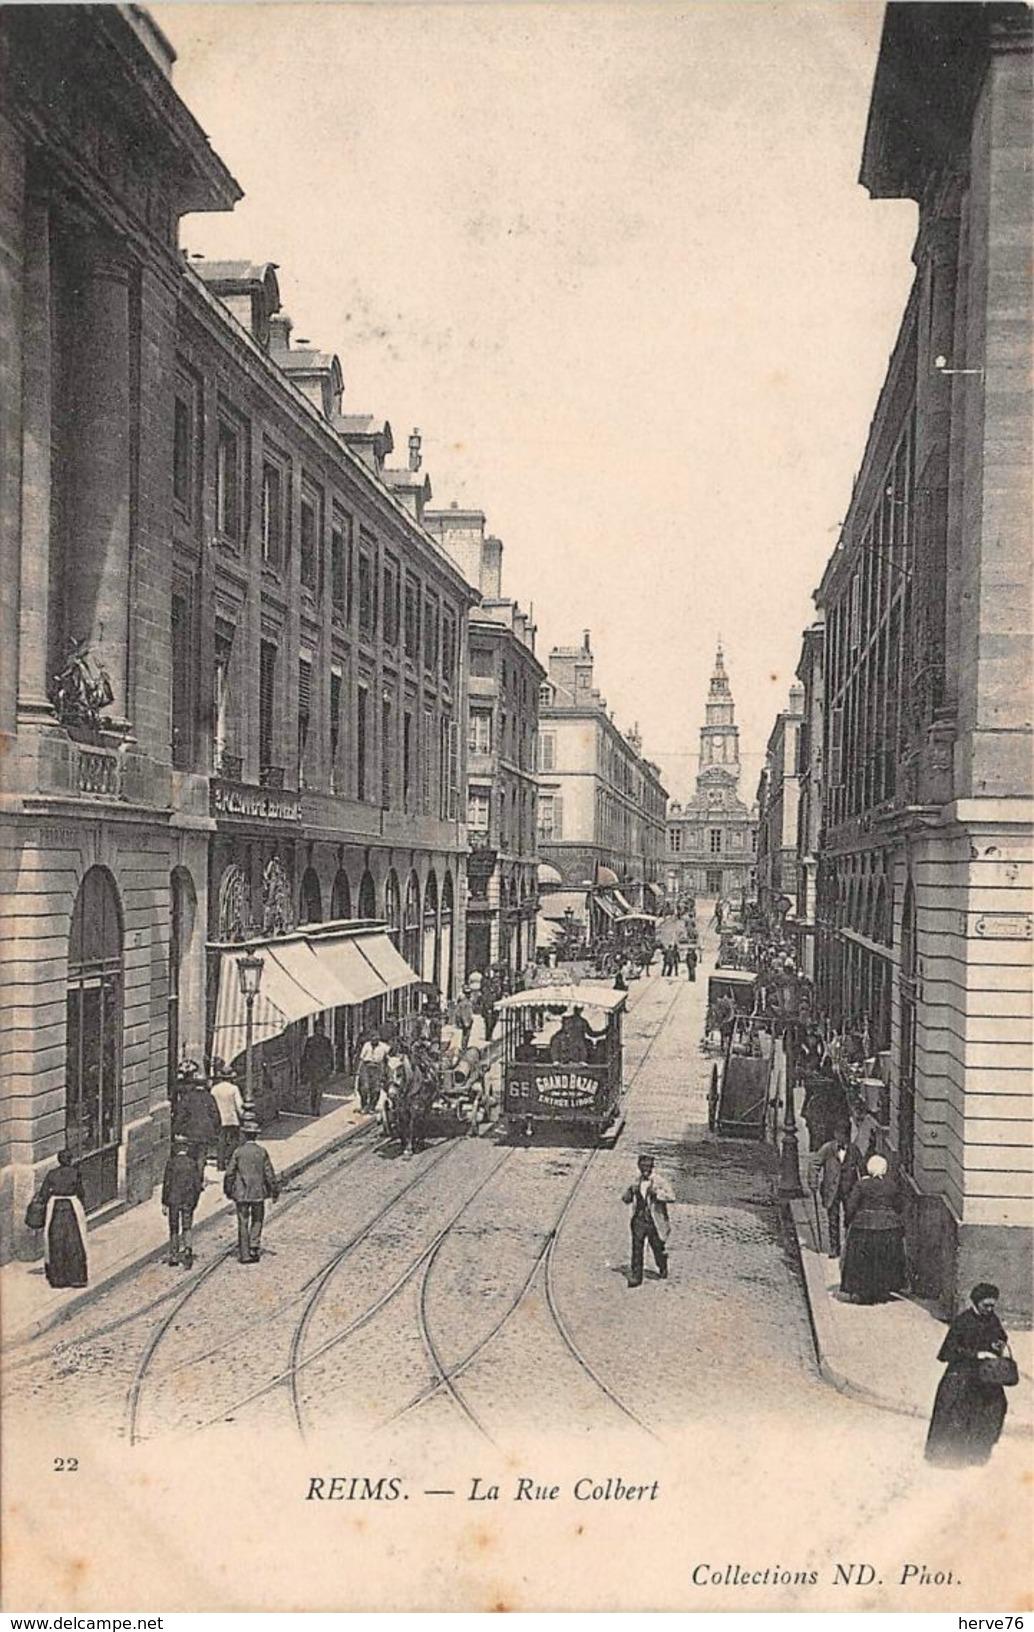 REIMS - La Rue Colbert - Tramway - Reims